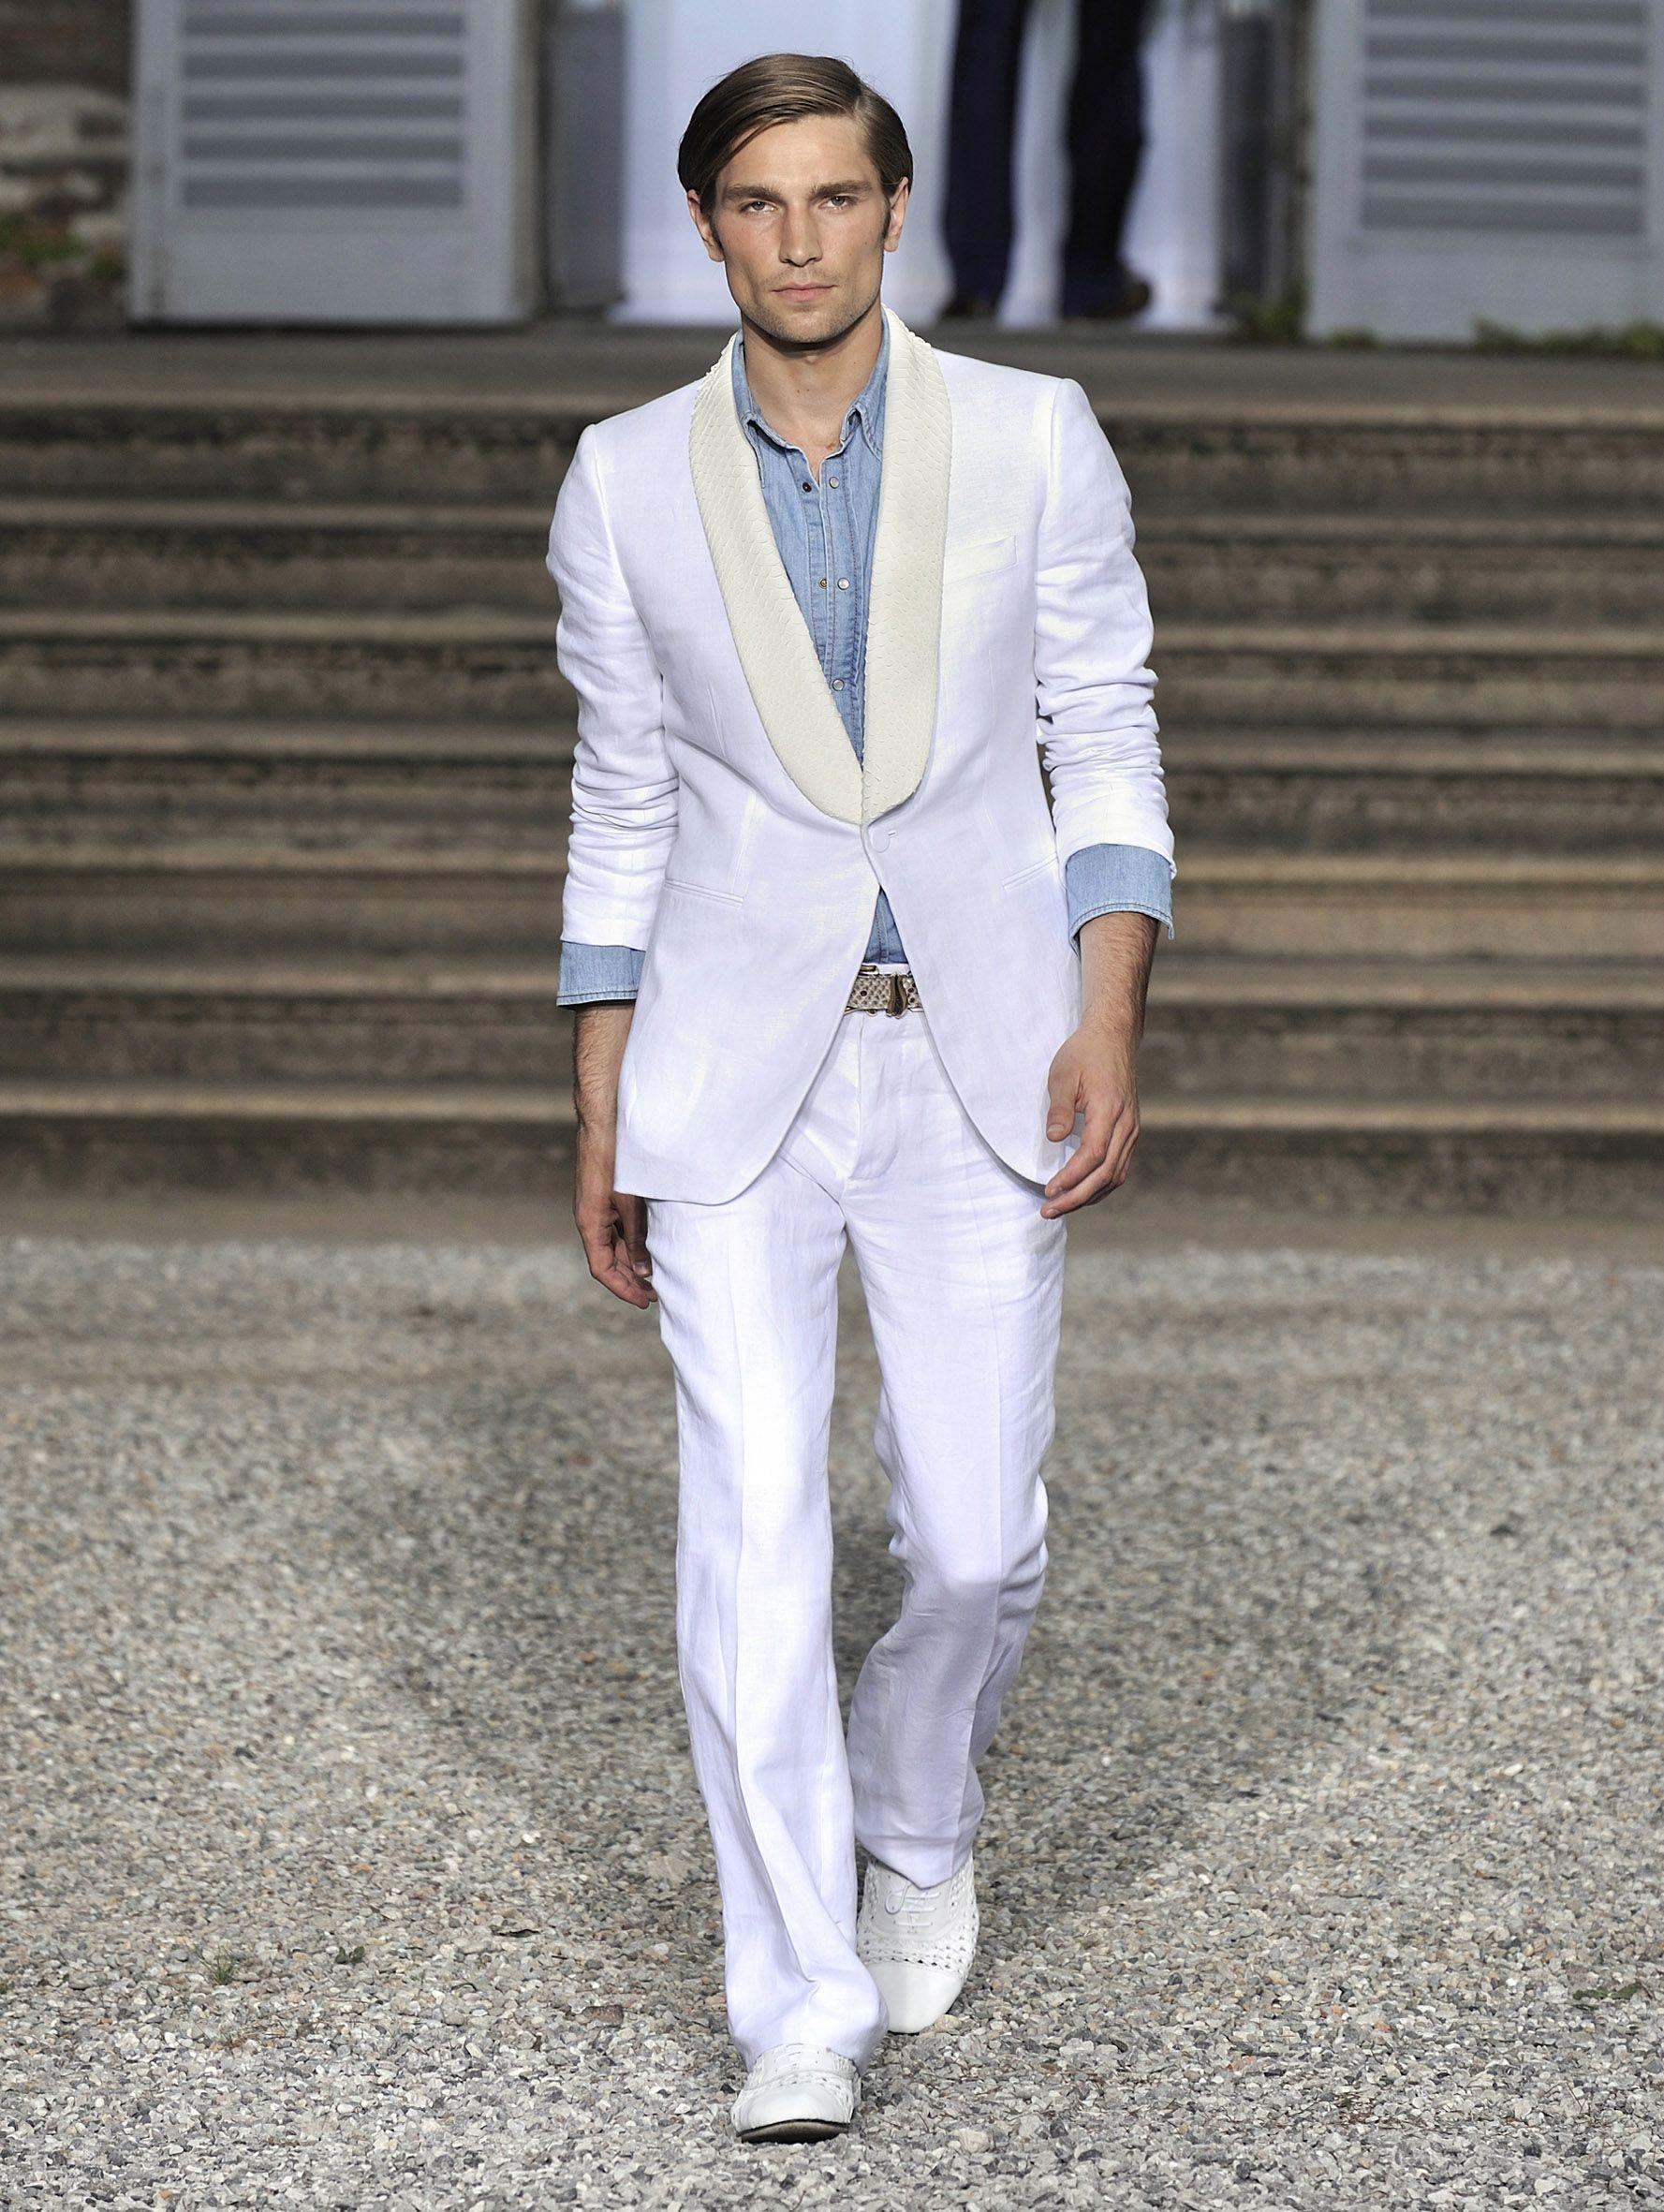 Roberto Cavalli Spring/Summer 2012 Men's Fashion Show - Look 12